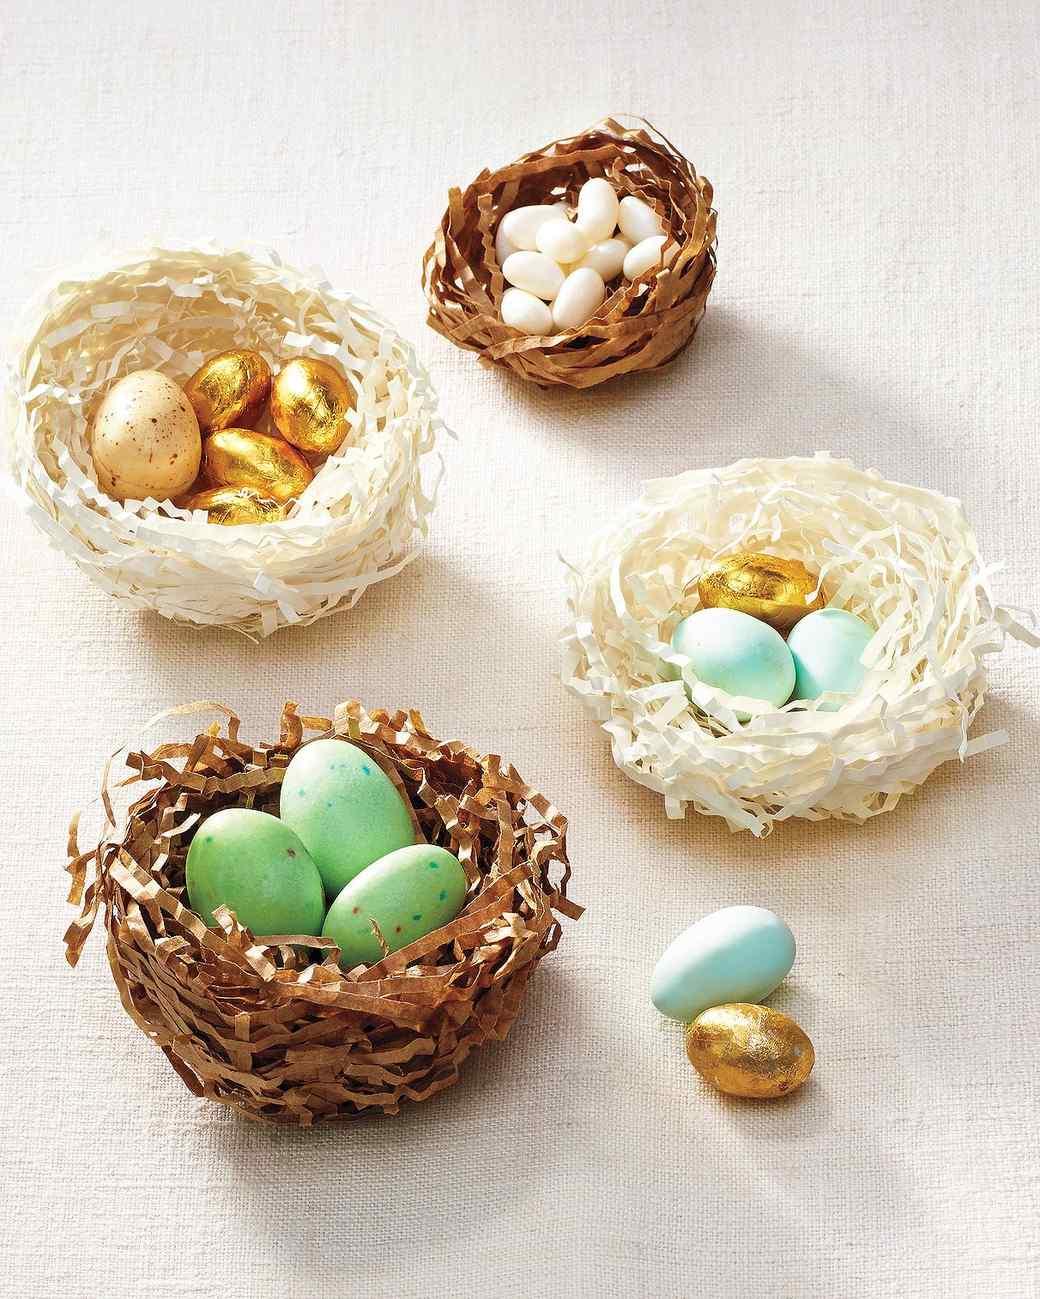 How to Make a Pretty Papier-Mache Bird's Nest for Easter